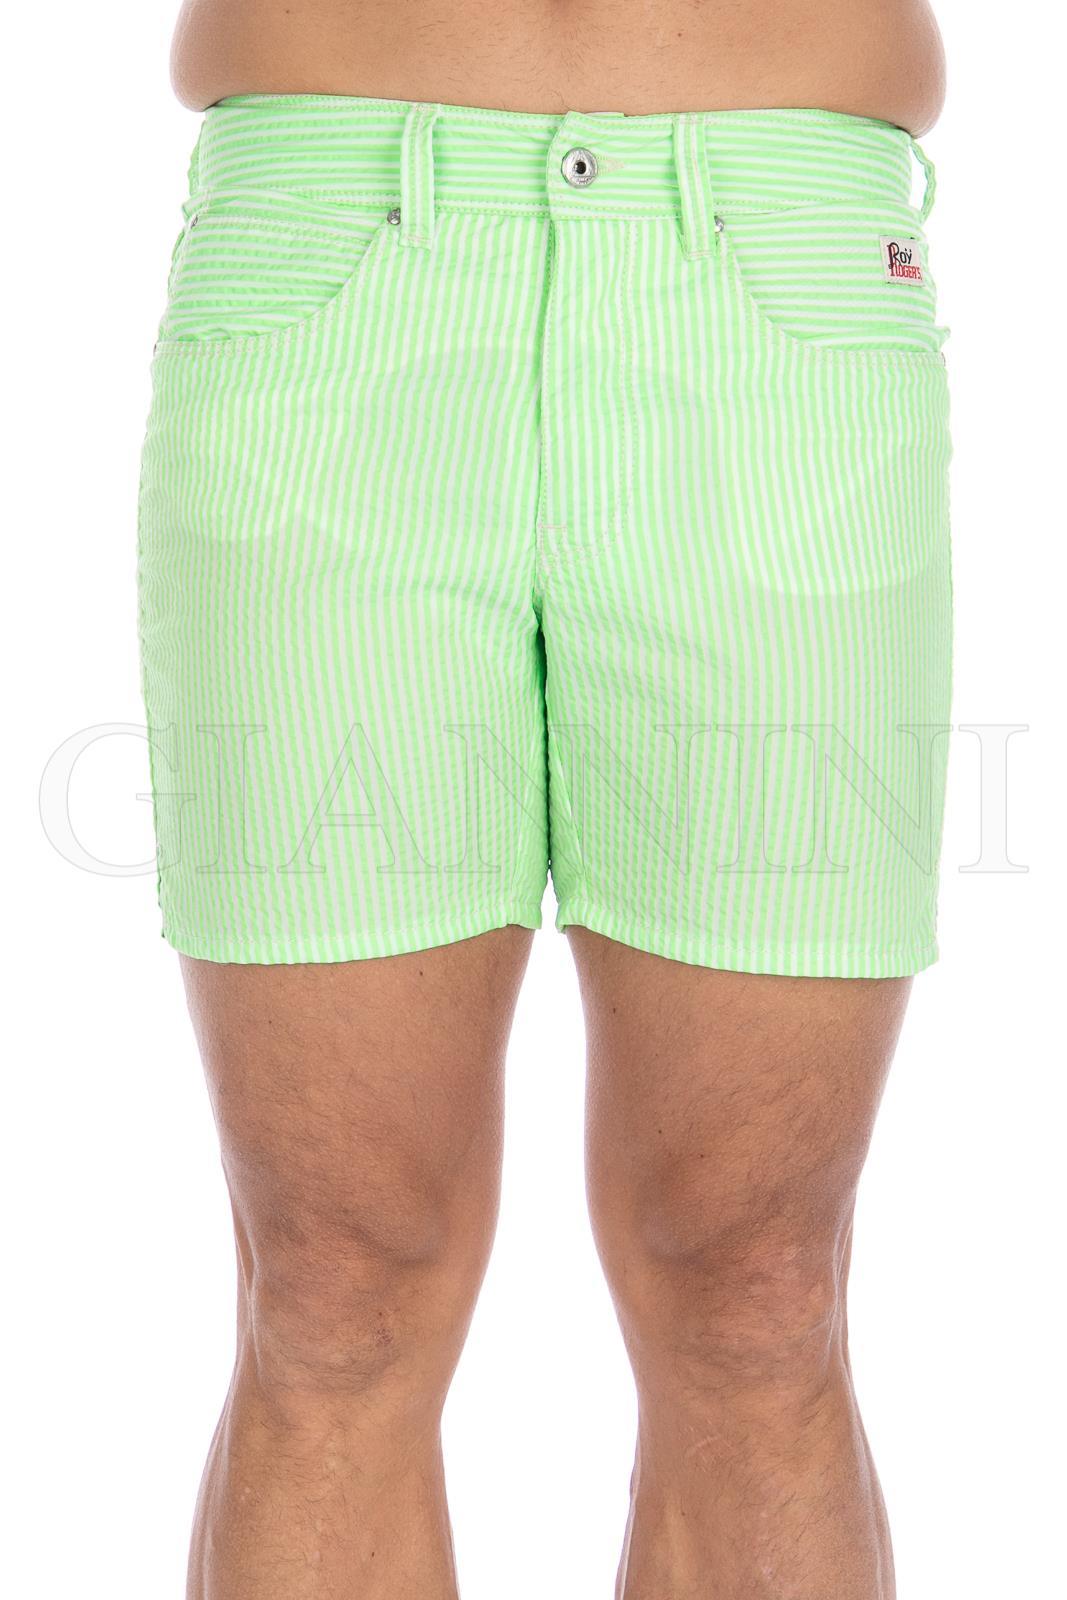 Verde Militare BEACH Costume Boxer Roy Rogers 2018 Tasche Impunture Contrasto